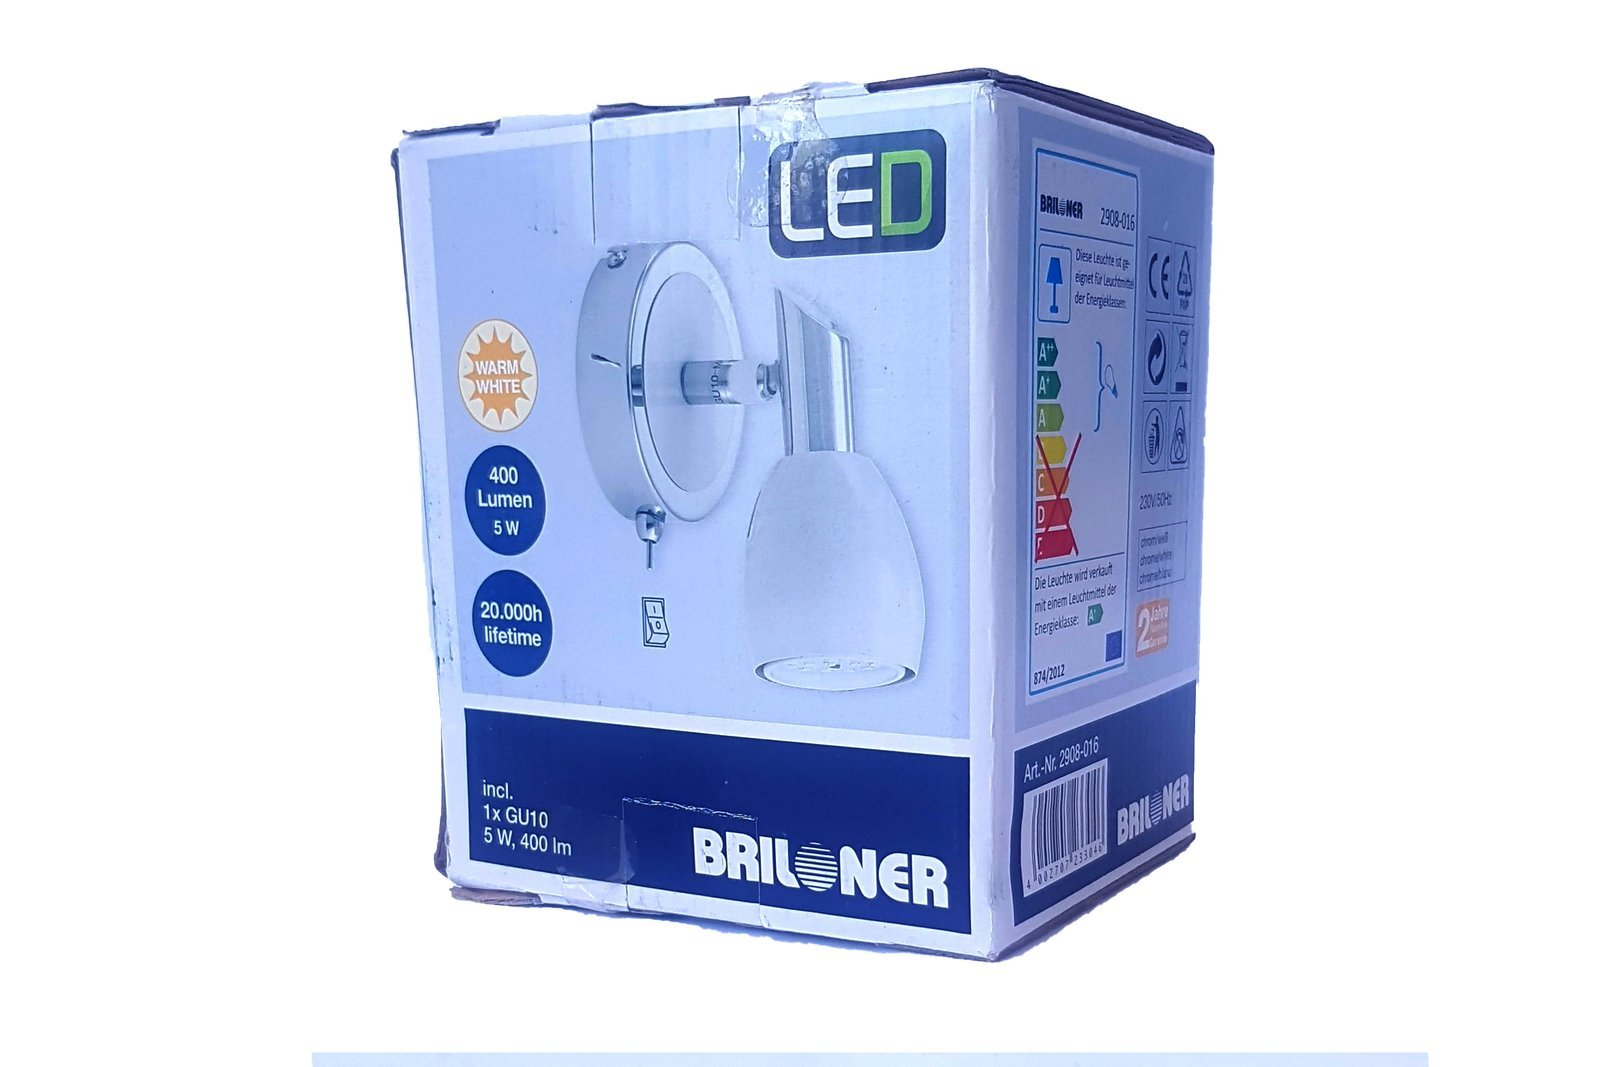 Briloner Spotlight 2908-016 1x GU10 5W LED